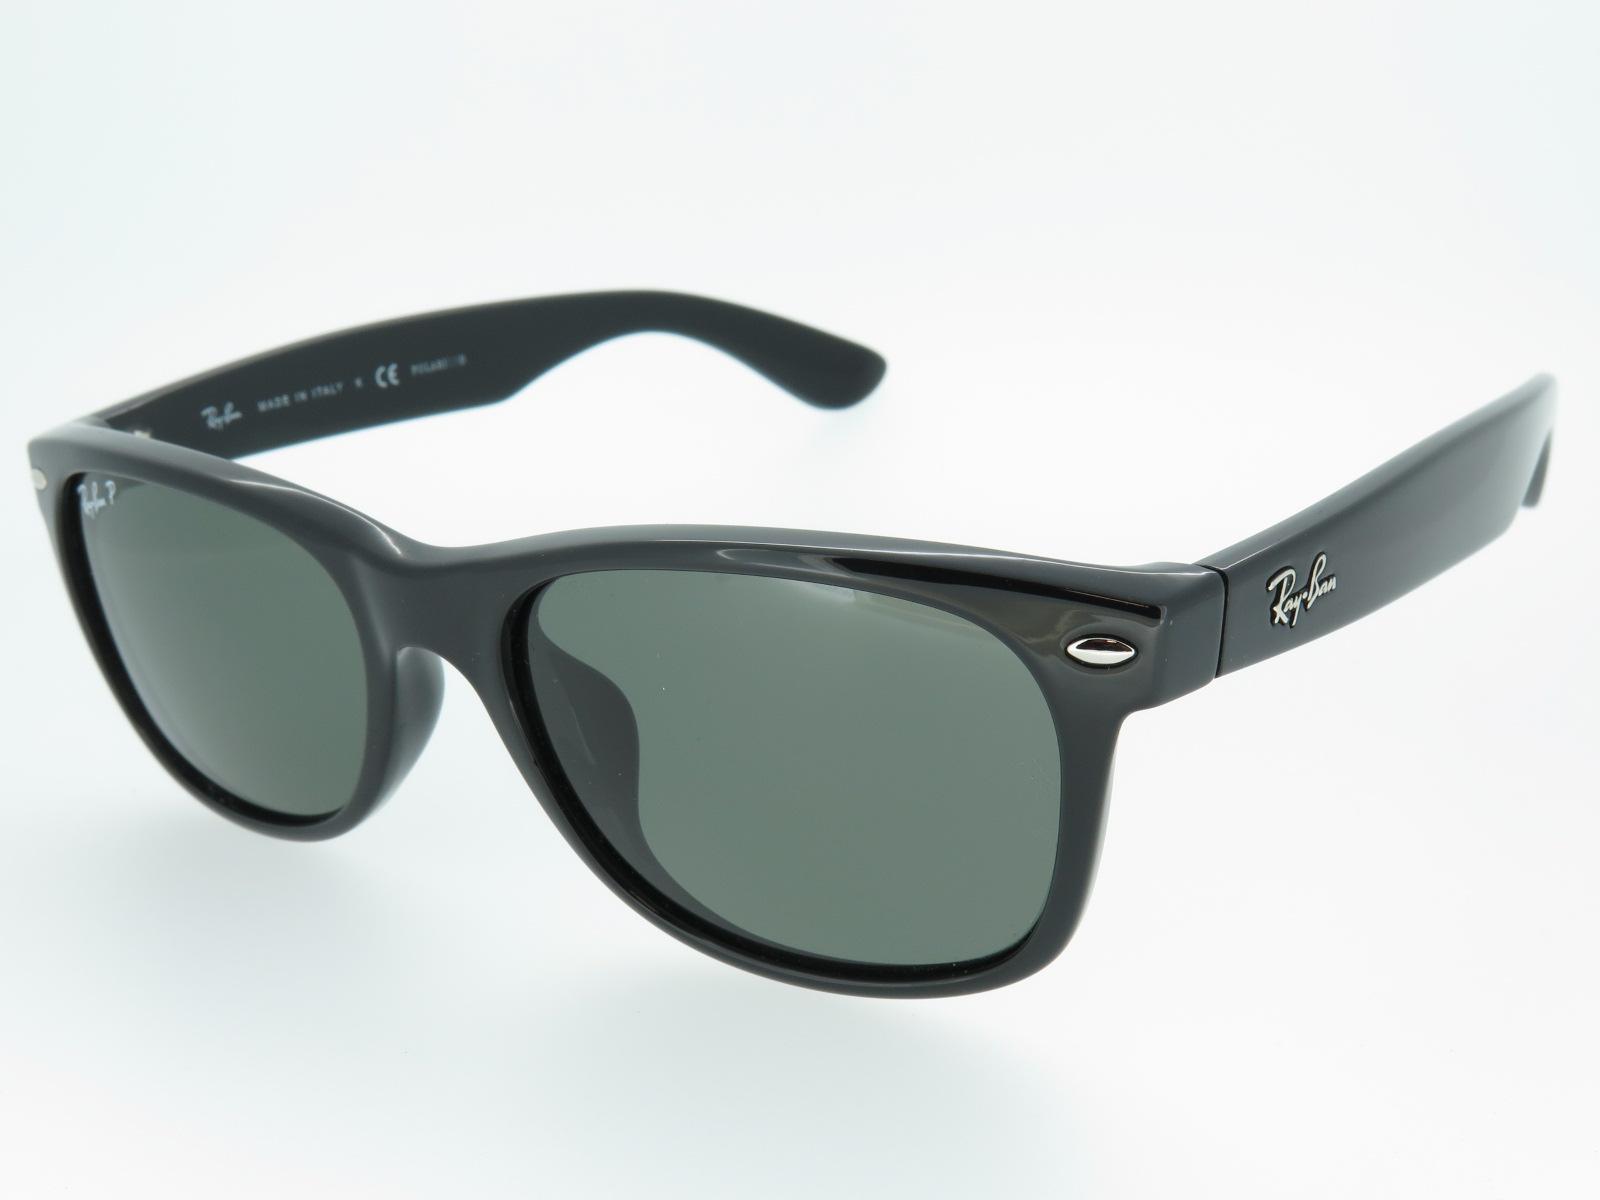 Ray-Ban レイバン ブランドサングラス 偏光レンズ NEW WAYFARER RB2132F 901/58 55サイズ